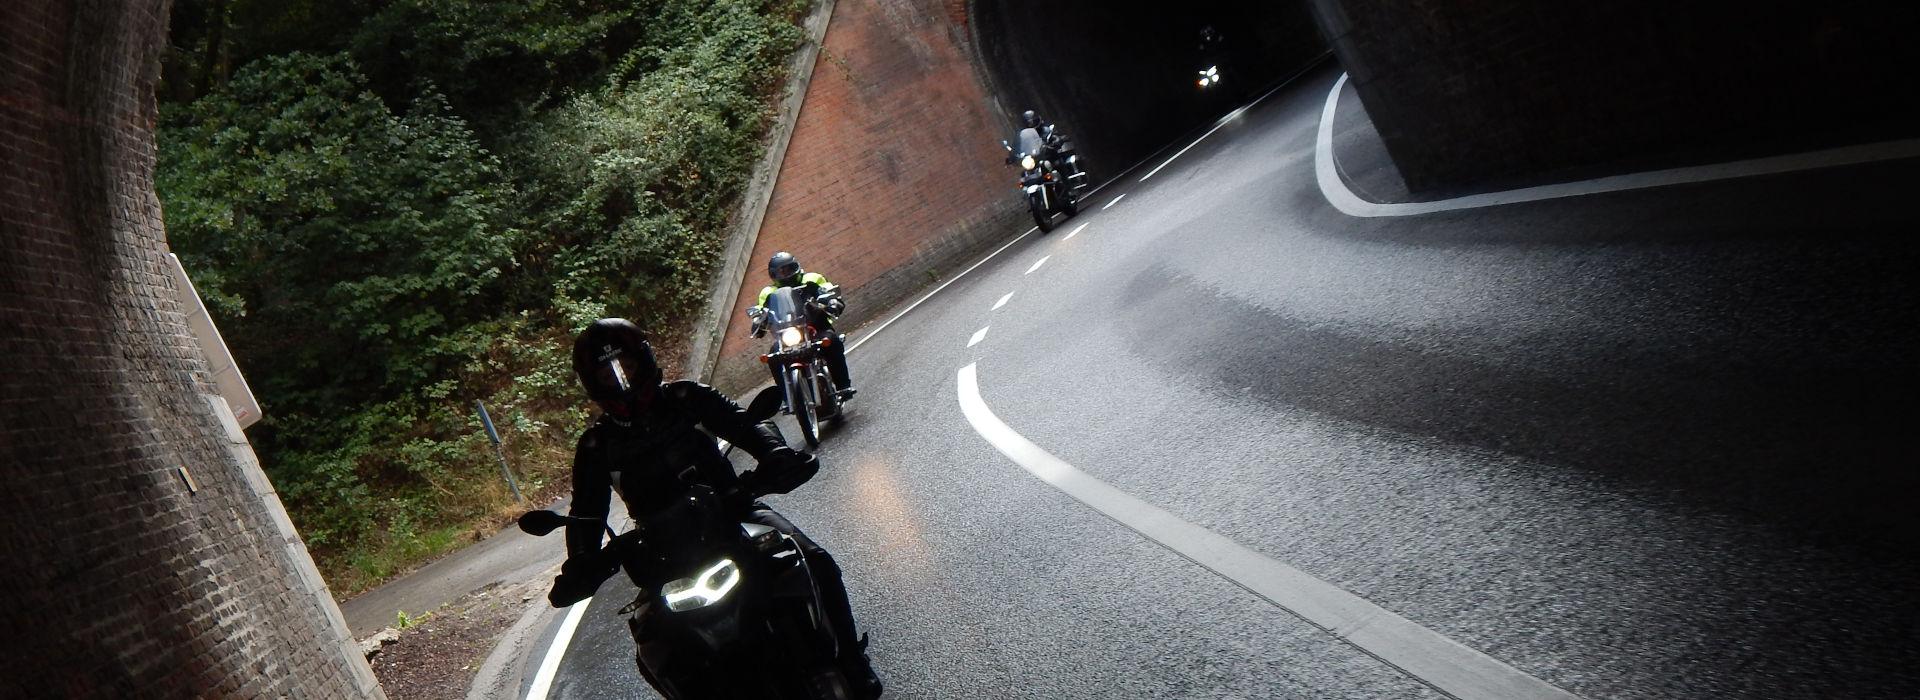 Motorrijbewijspoint Arnhem disclaimer